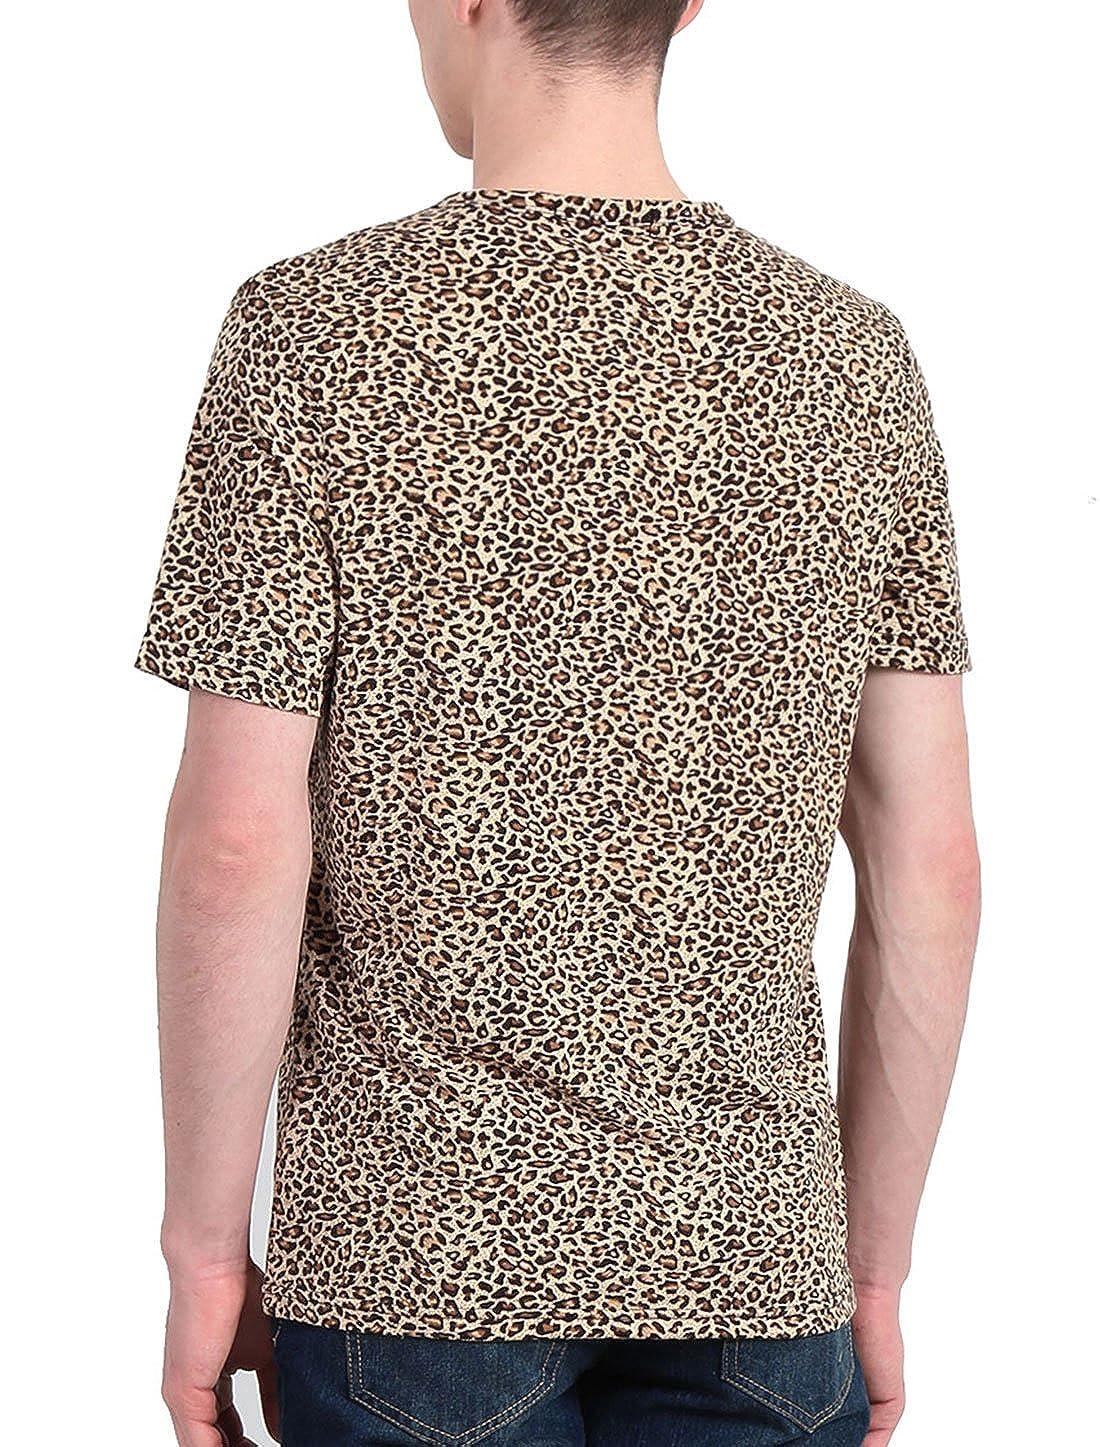 0504b75a07 Amazon.com: uxcell Men Short Sleeve Round Neck Leopard Print T Shirt:  Clothing